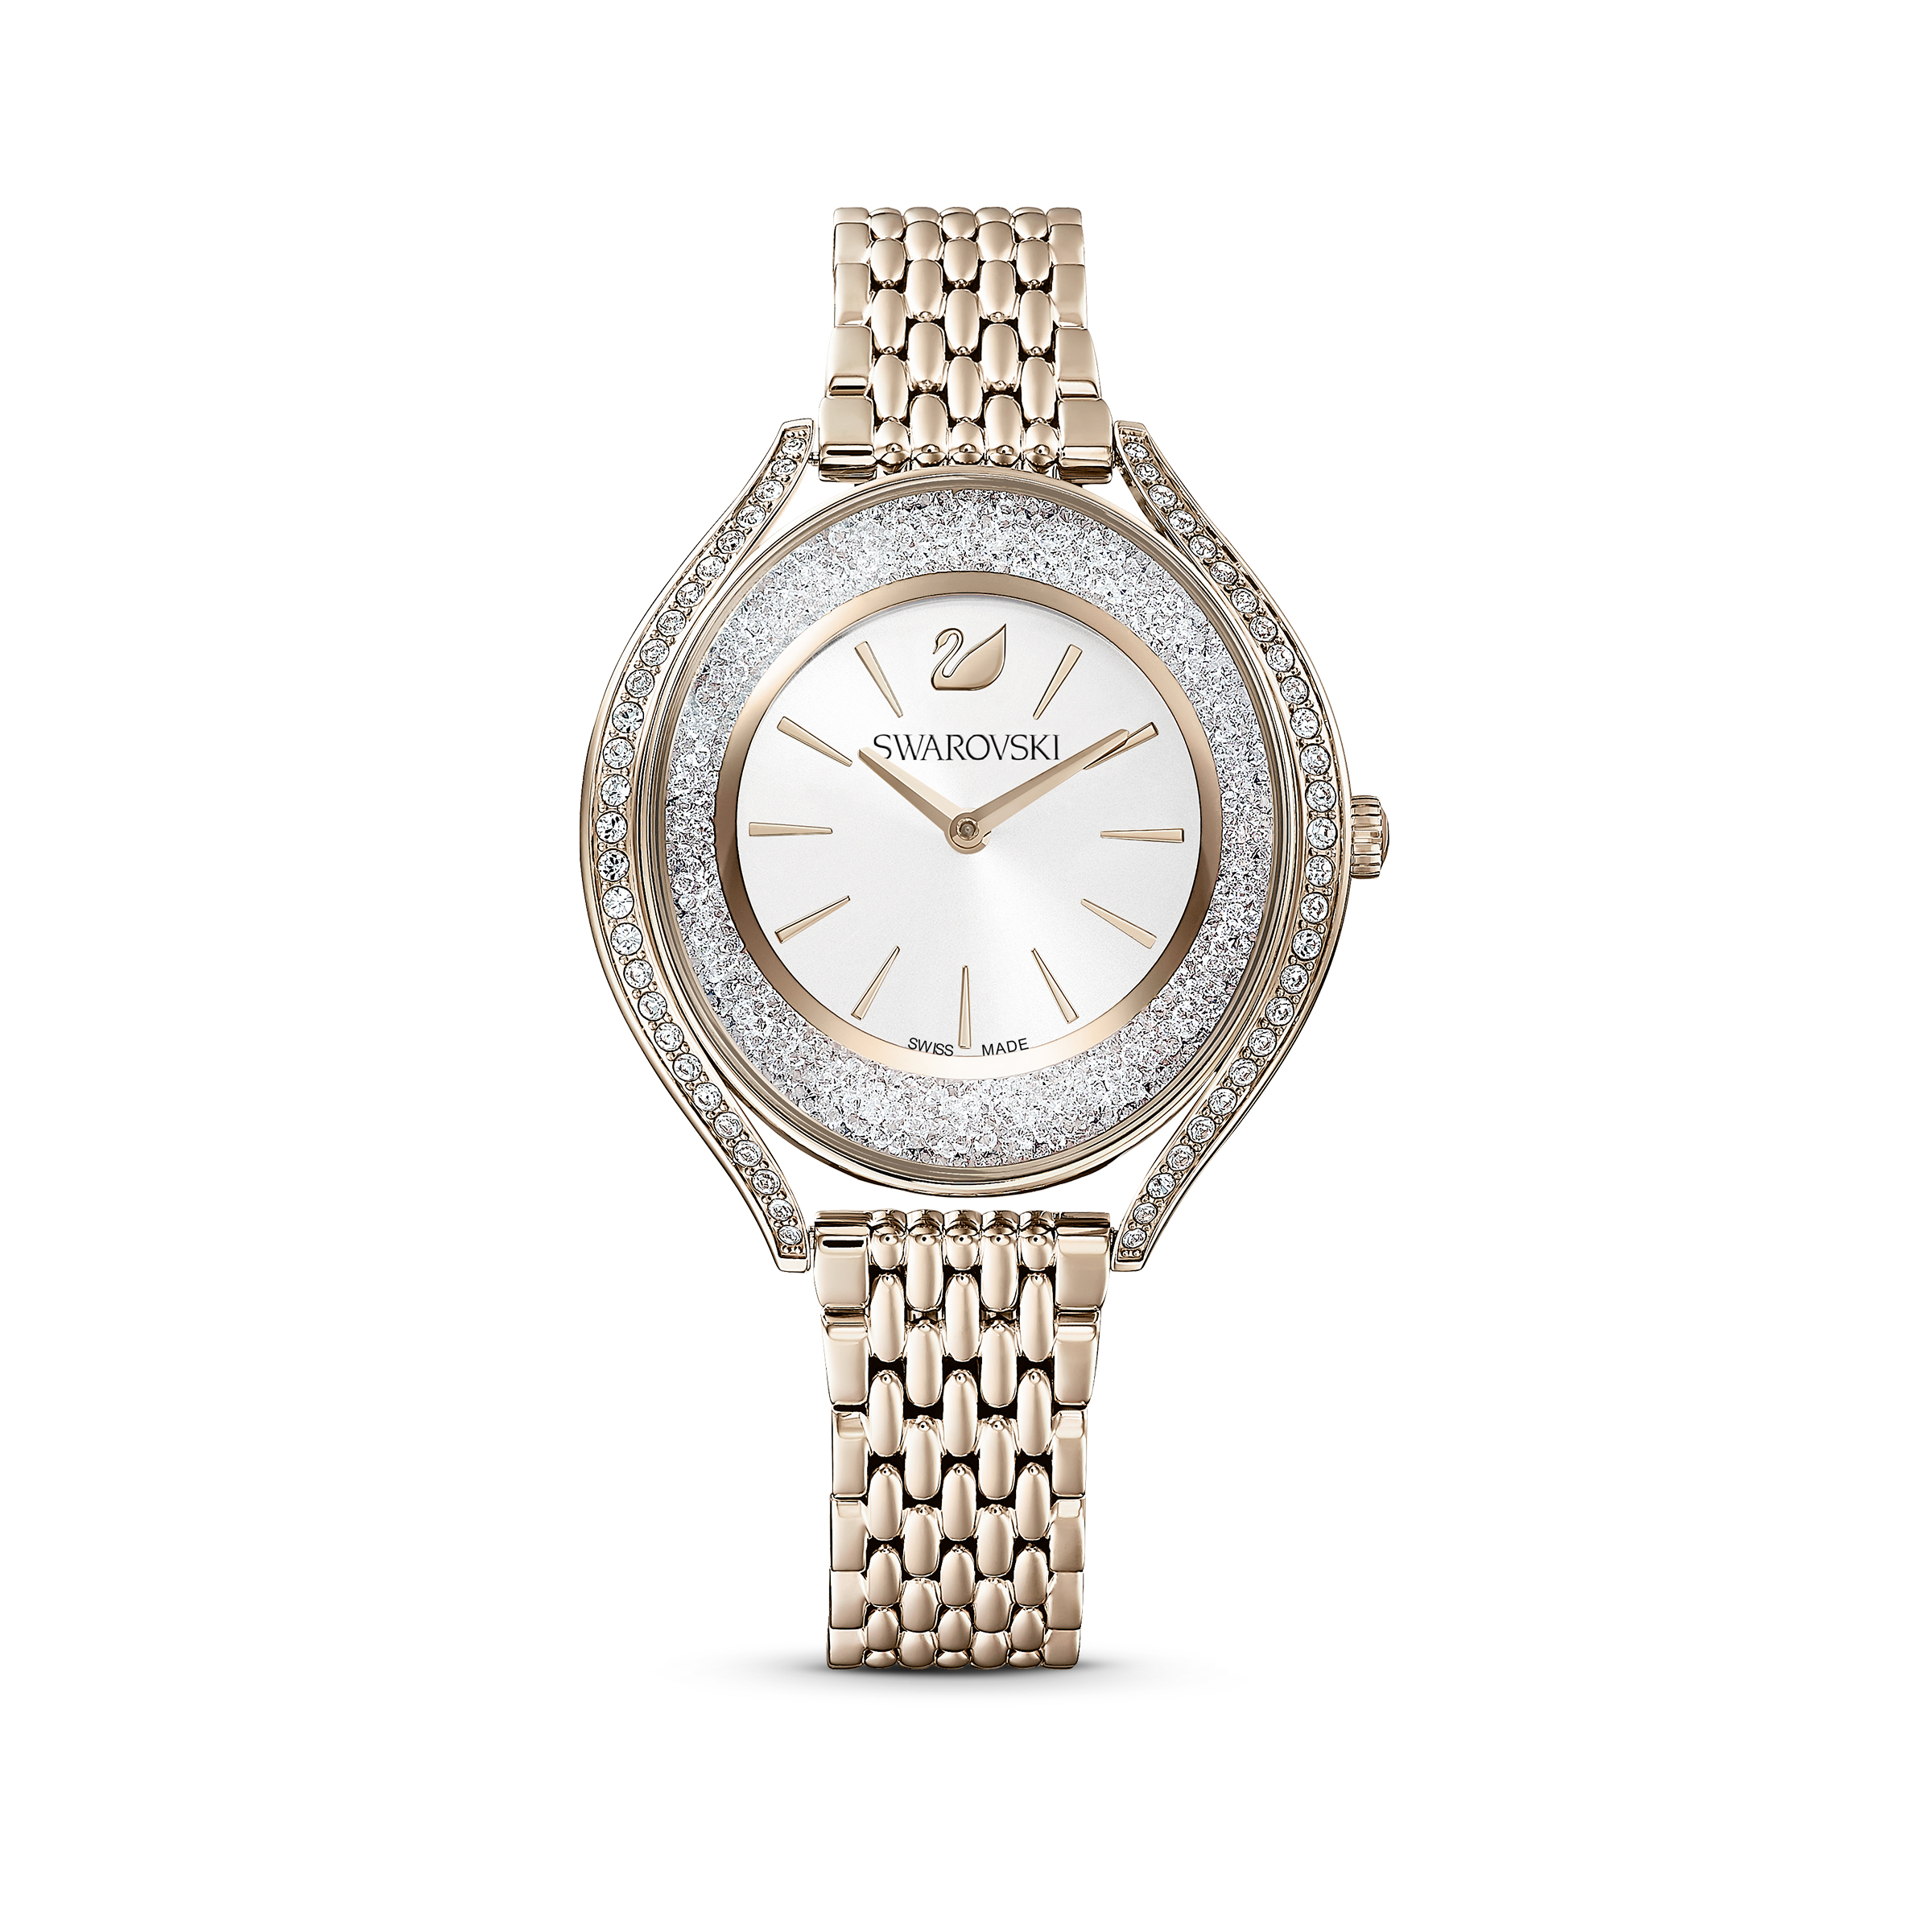 Montre Crystalline Aura, bracelet en métal, ton doré, PVD doré champagne, Swarovski